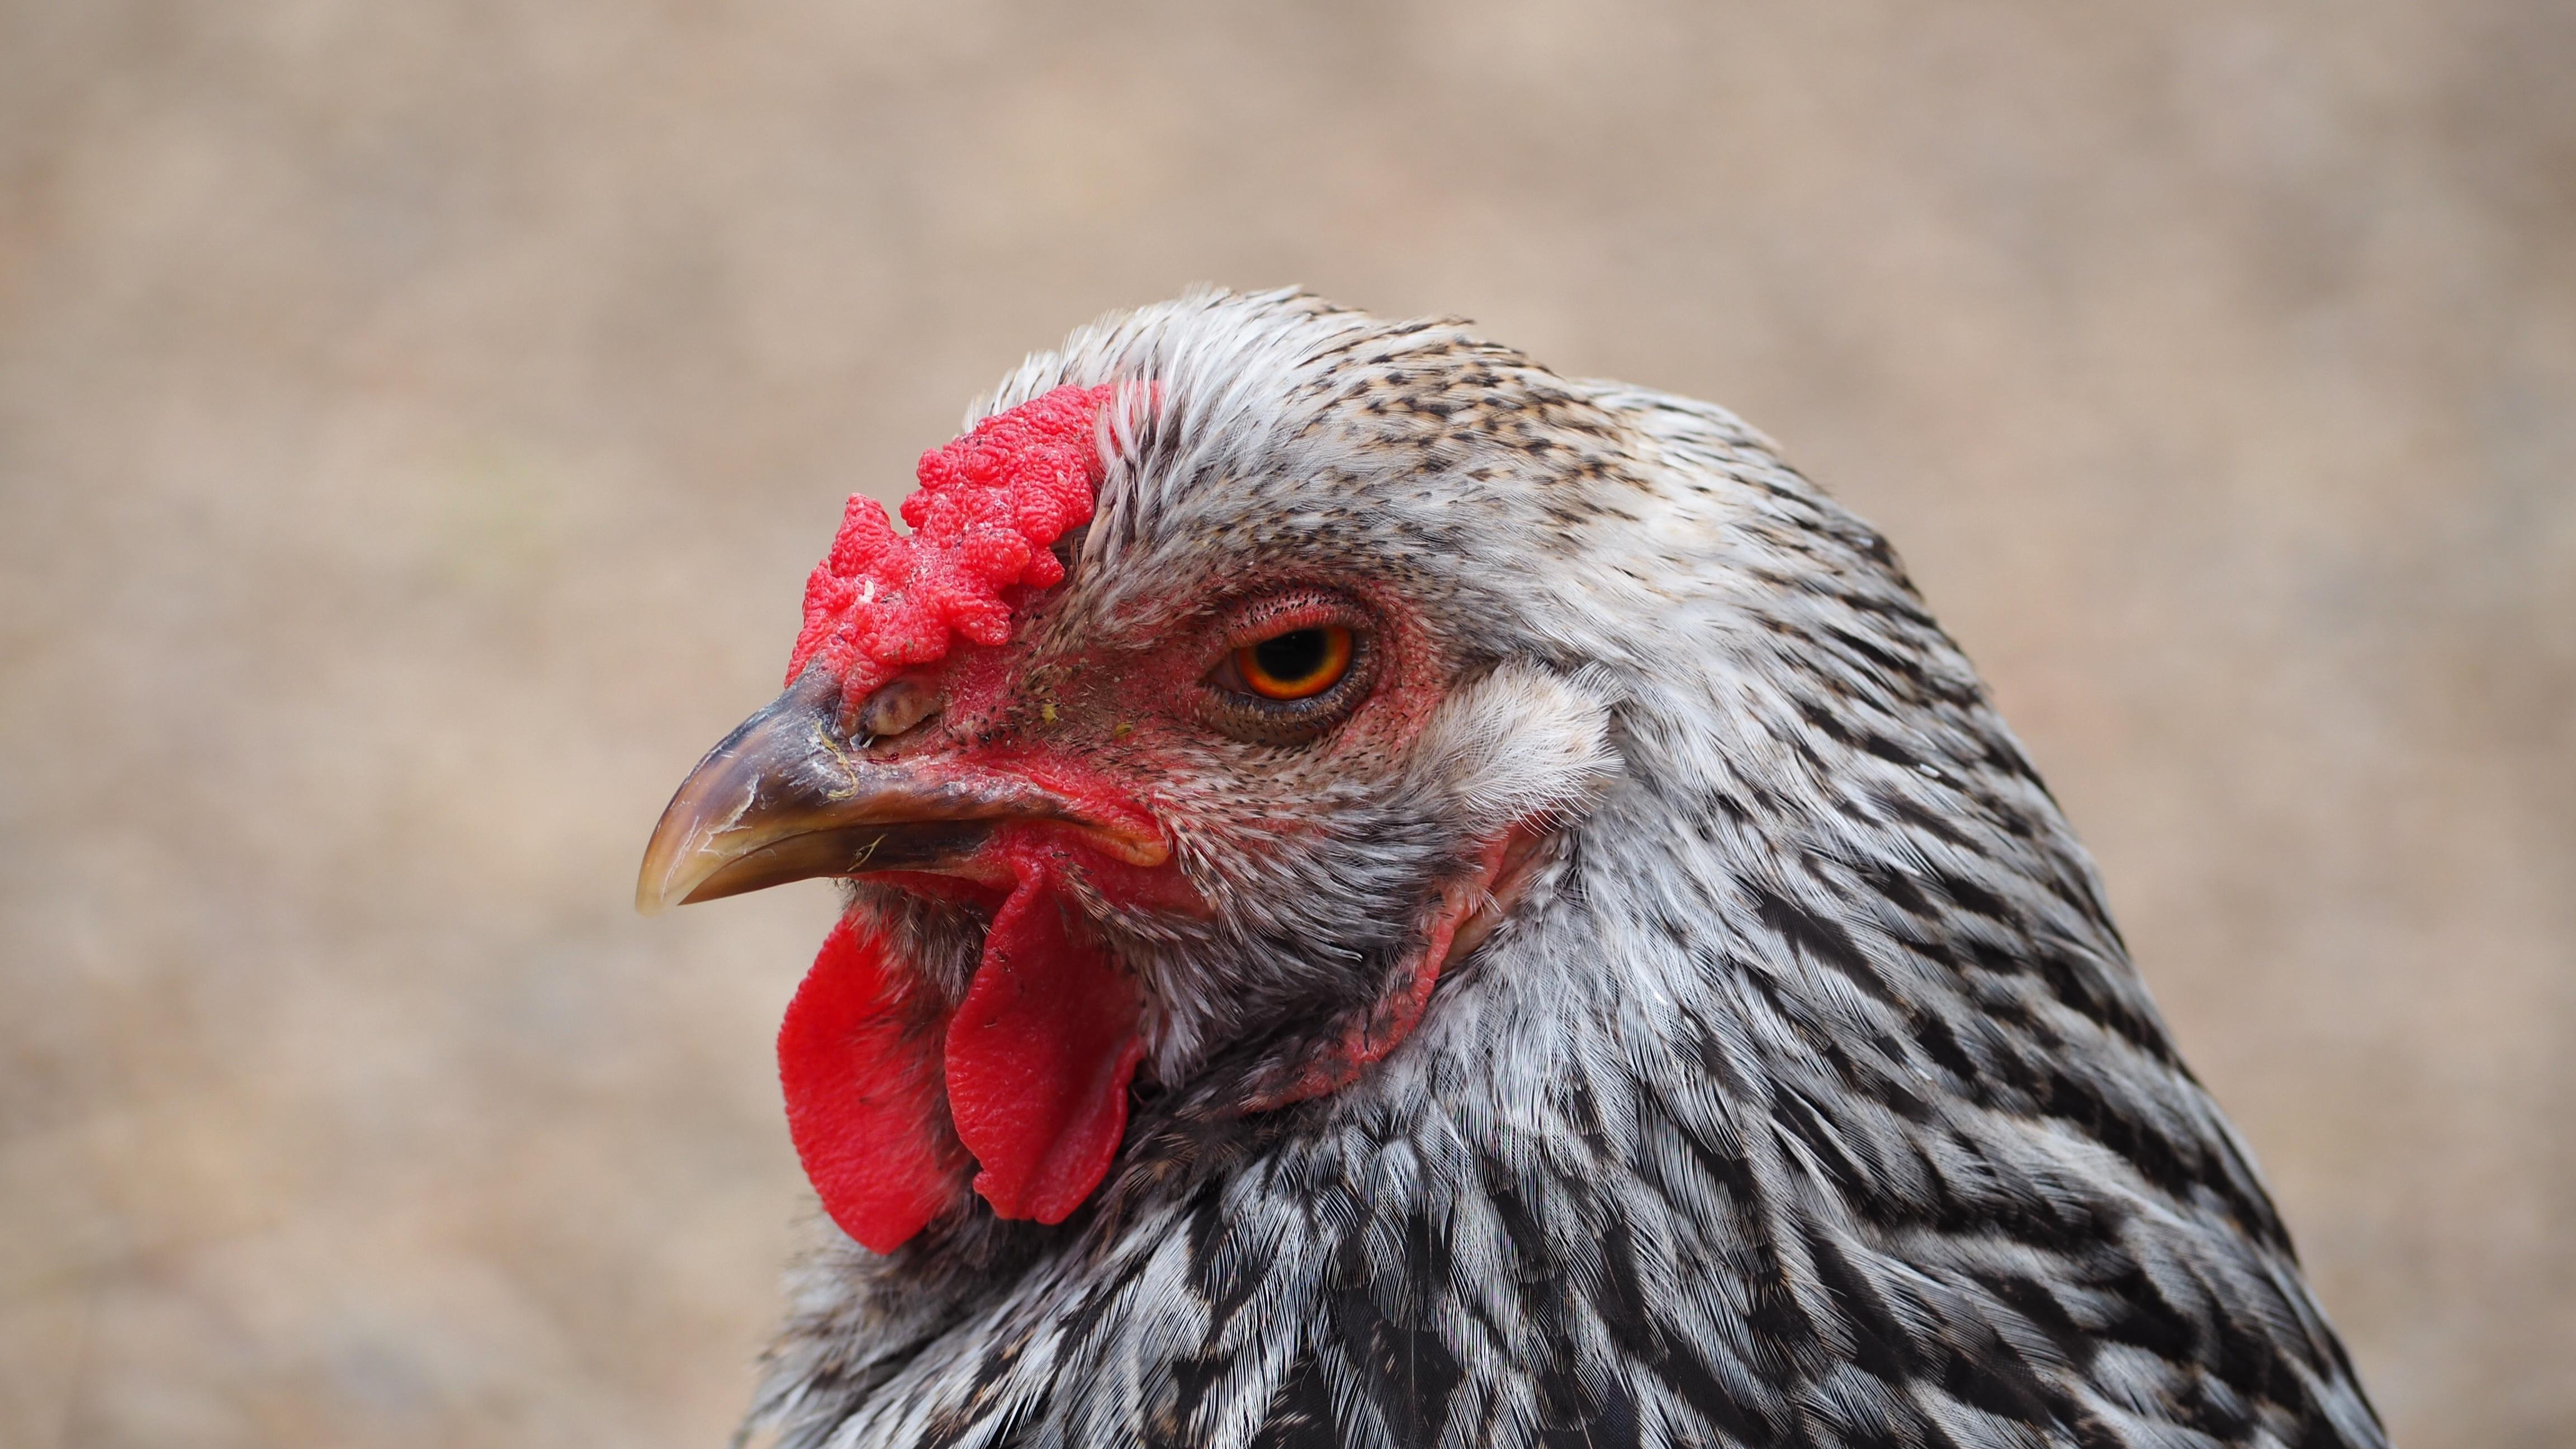 Fotos gratis : pájaro, ala, fauna silvestre, patrón, retrato, pico ...